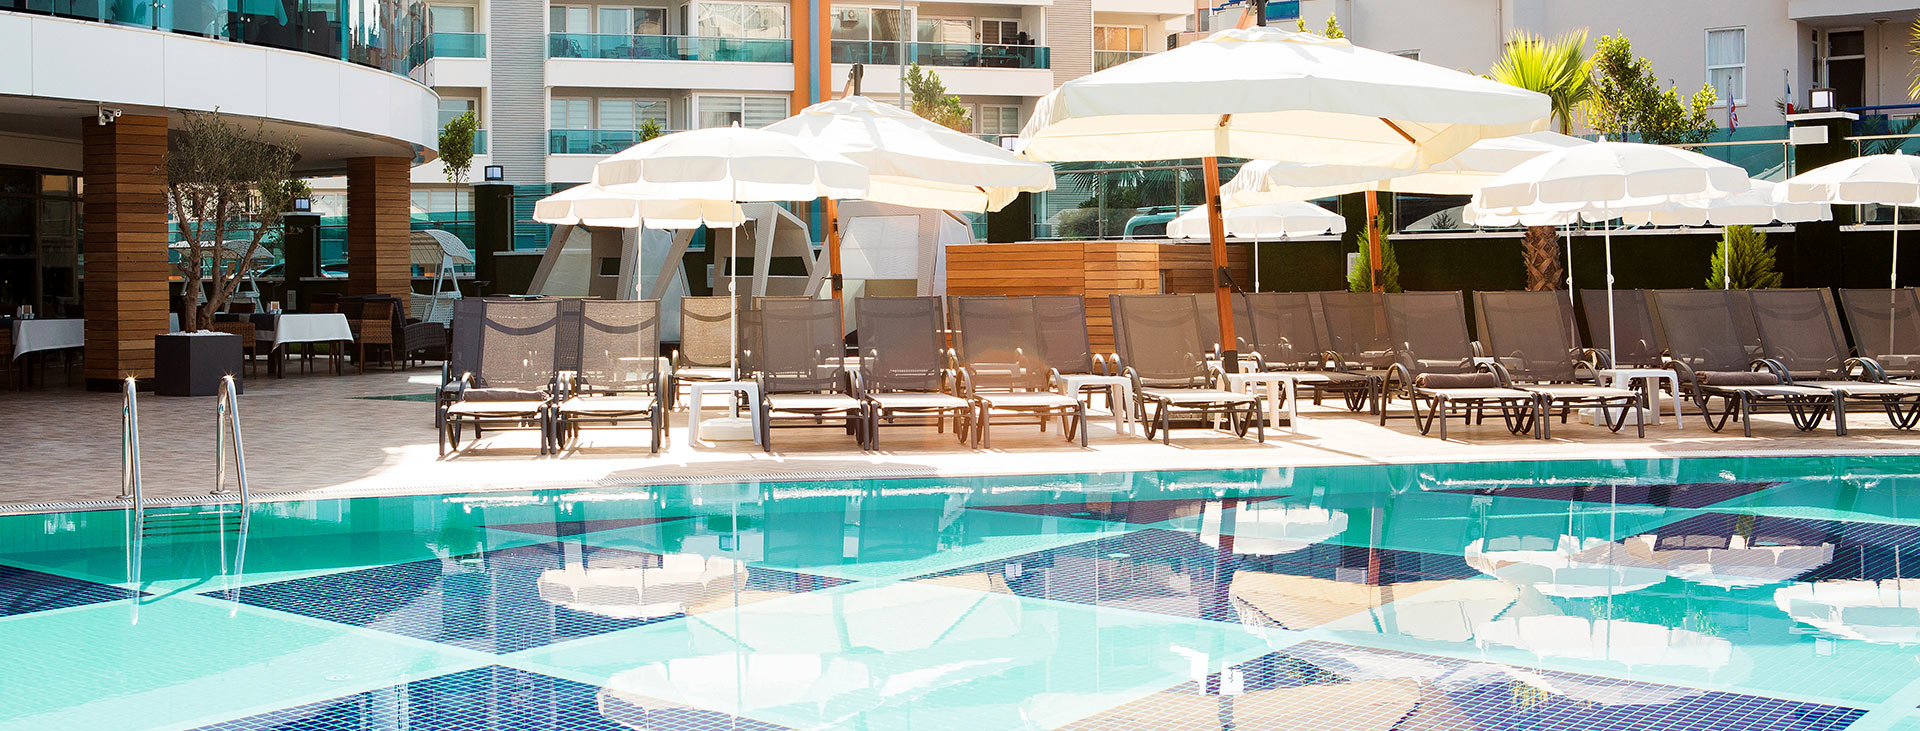 Sunprime C-Lounge, Alanya, Antalya-området, Turkiet